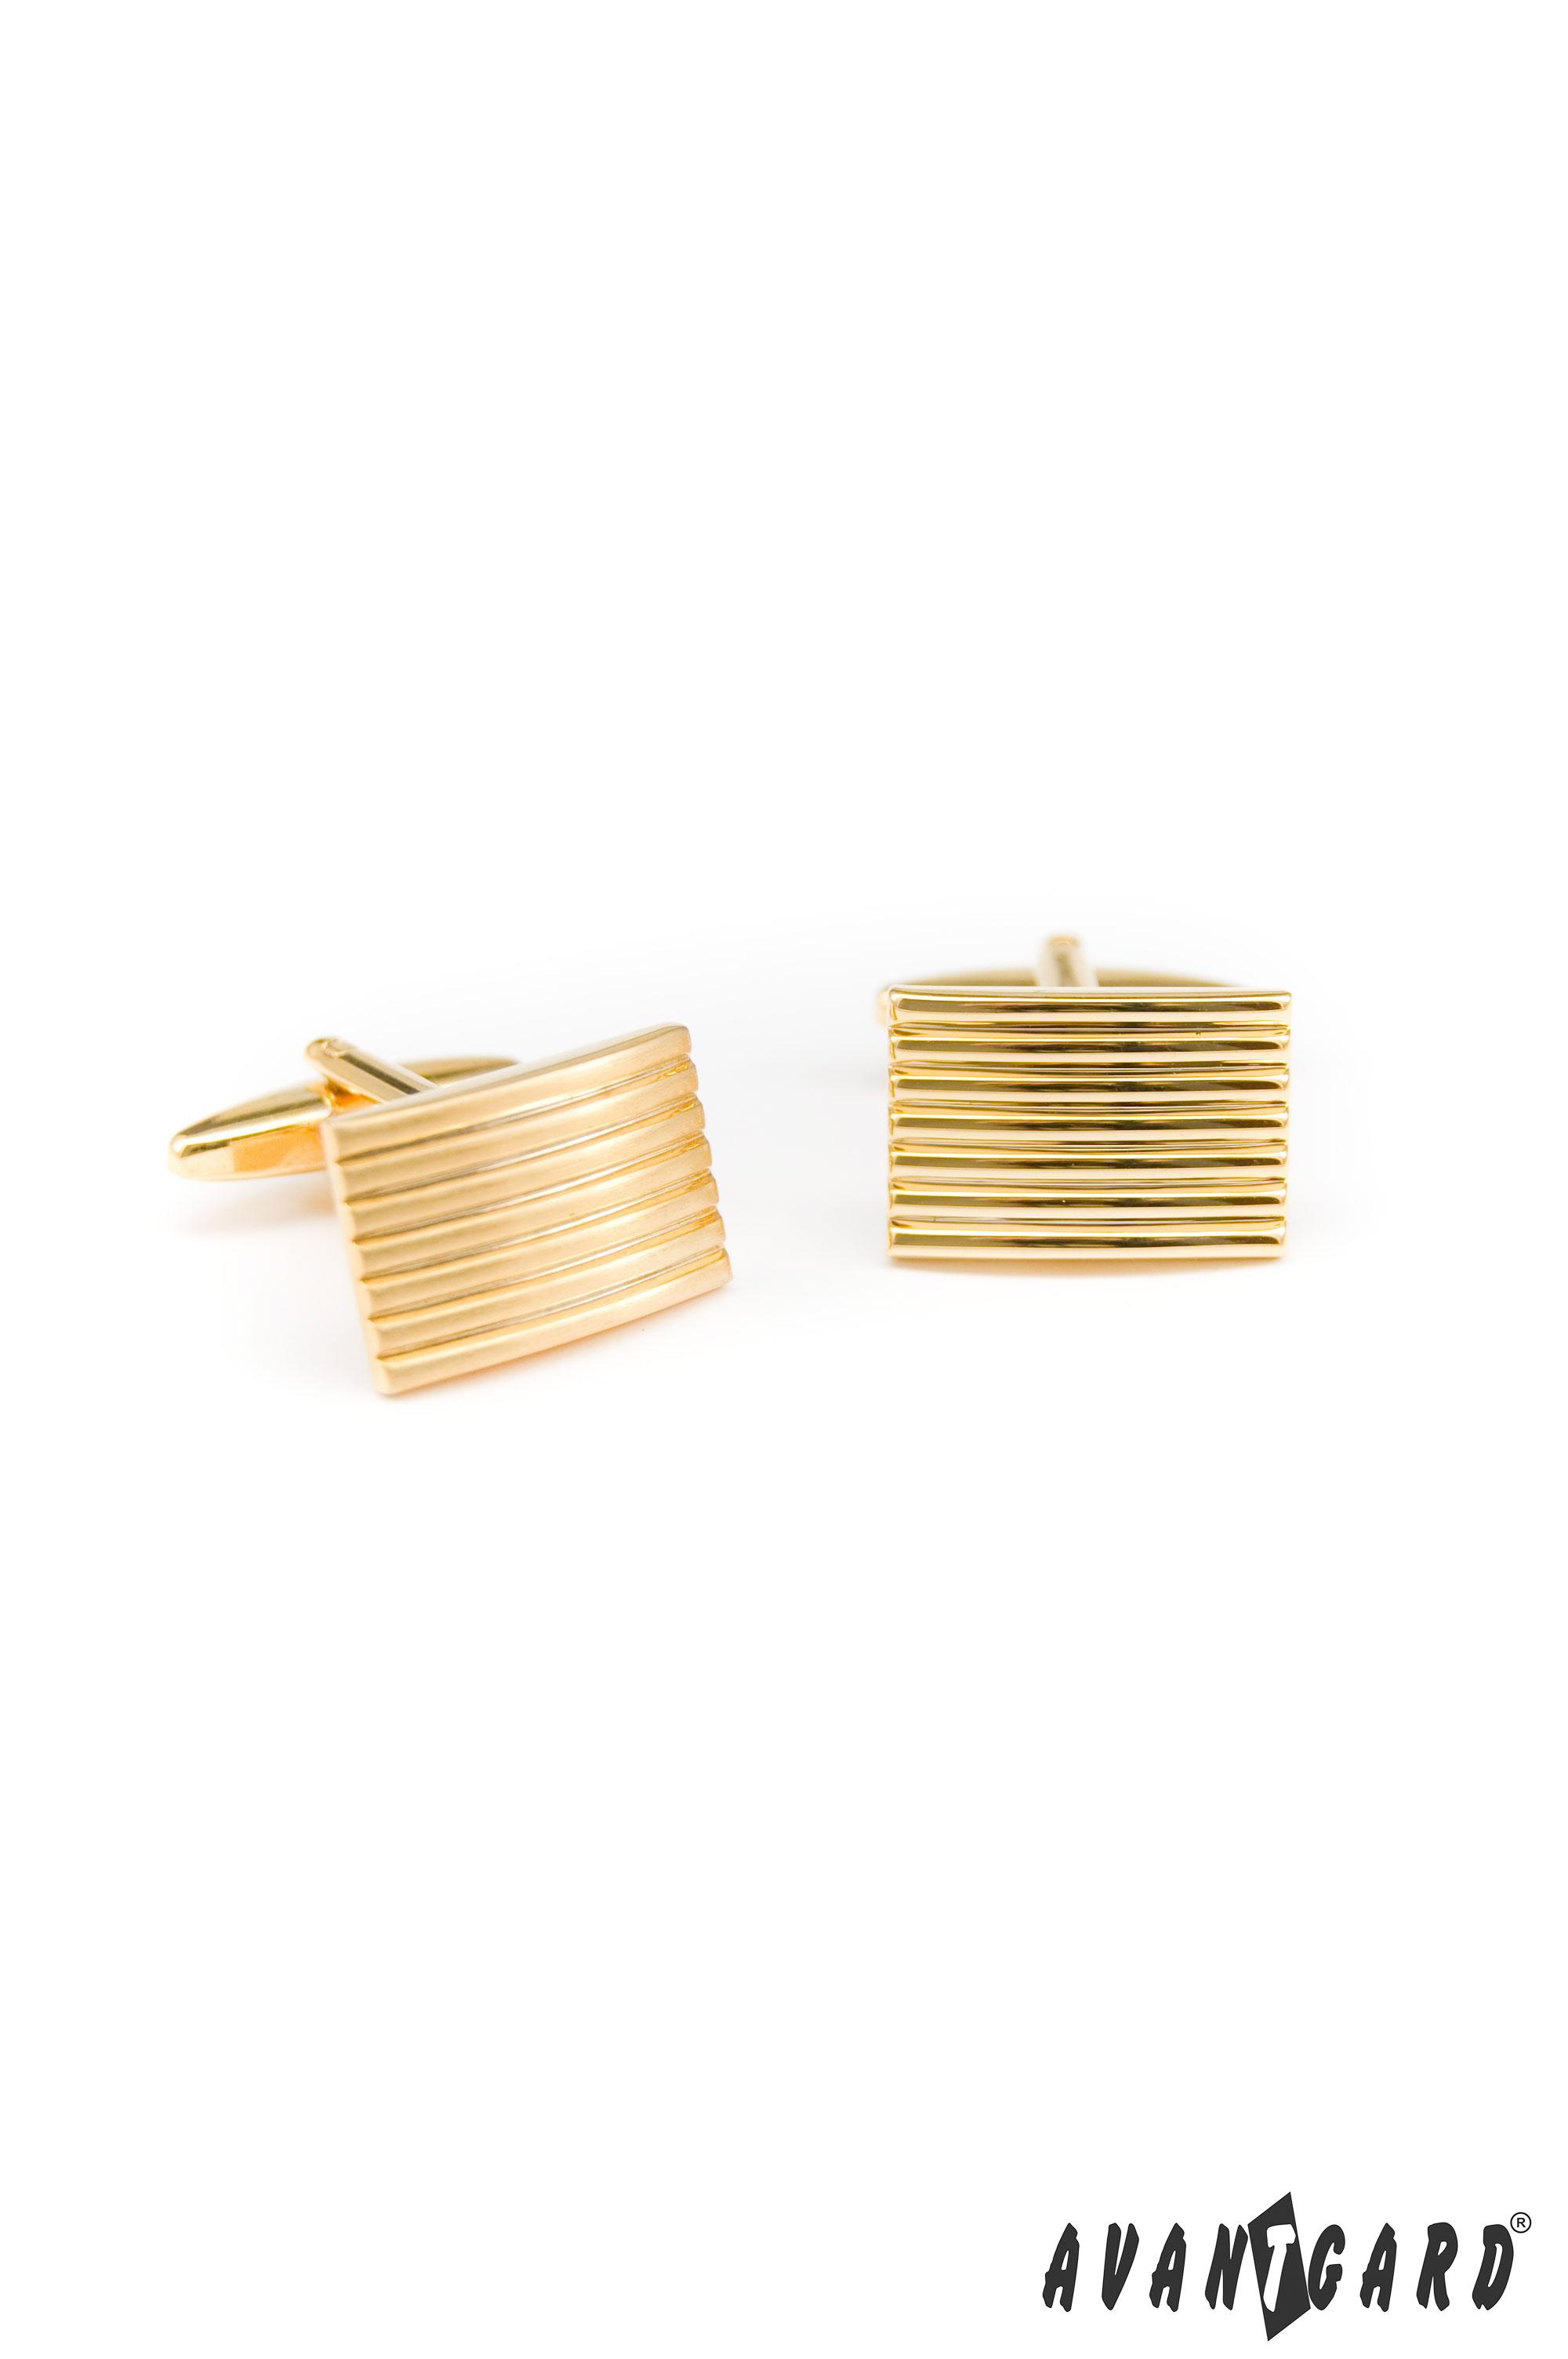 Avantgard manžetové knoflíky Premium 57310047 Zlatá lesk